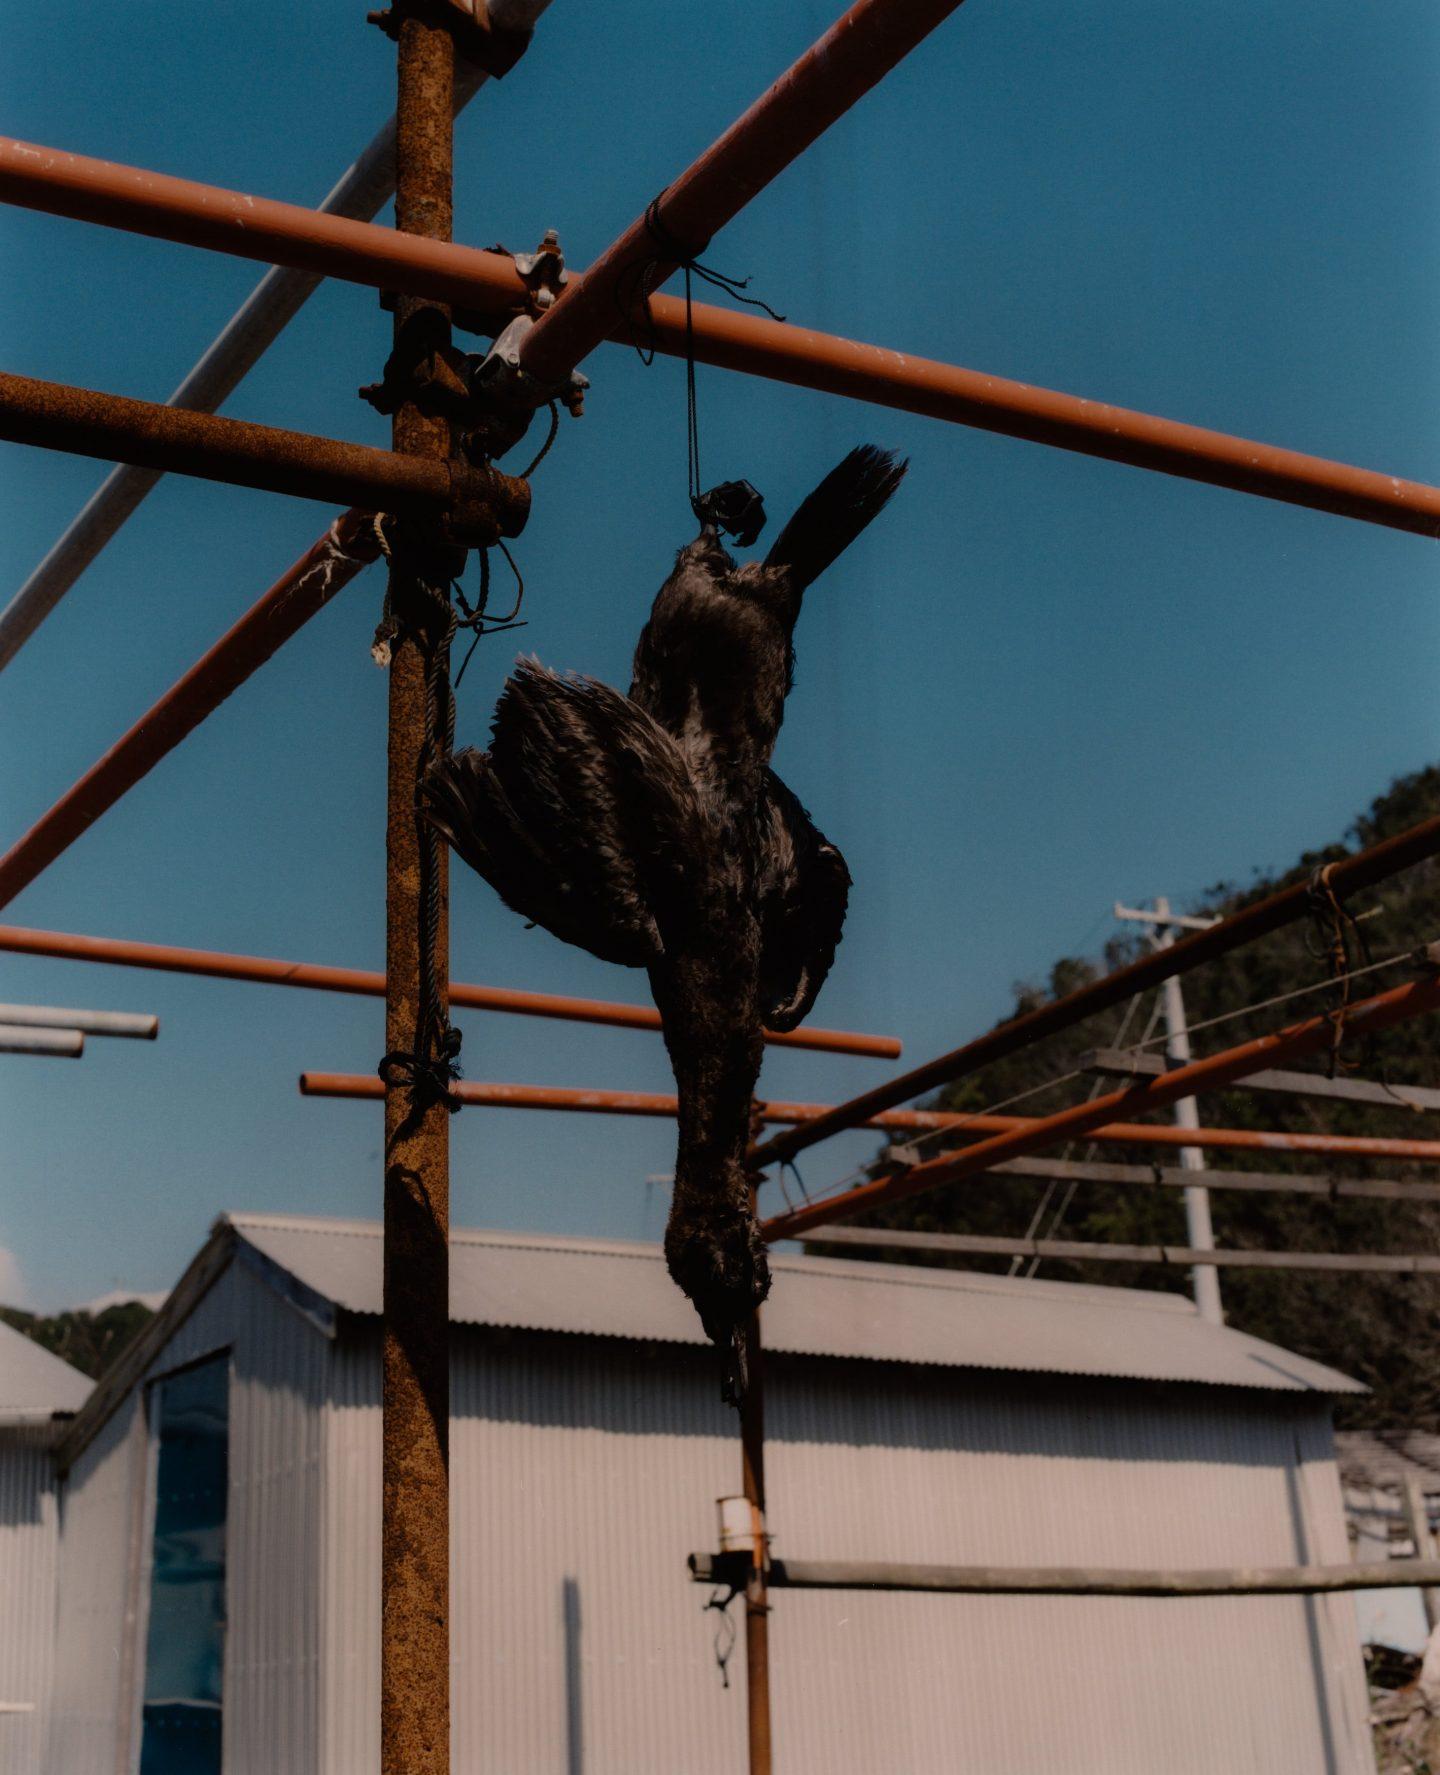 IGNANT-Photography-Stefan-Dotter-Sea-Women-Japan-06